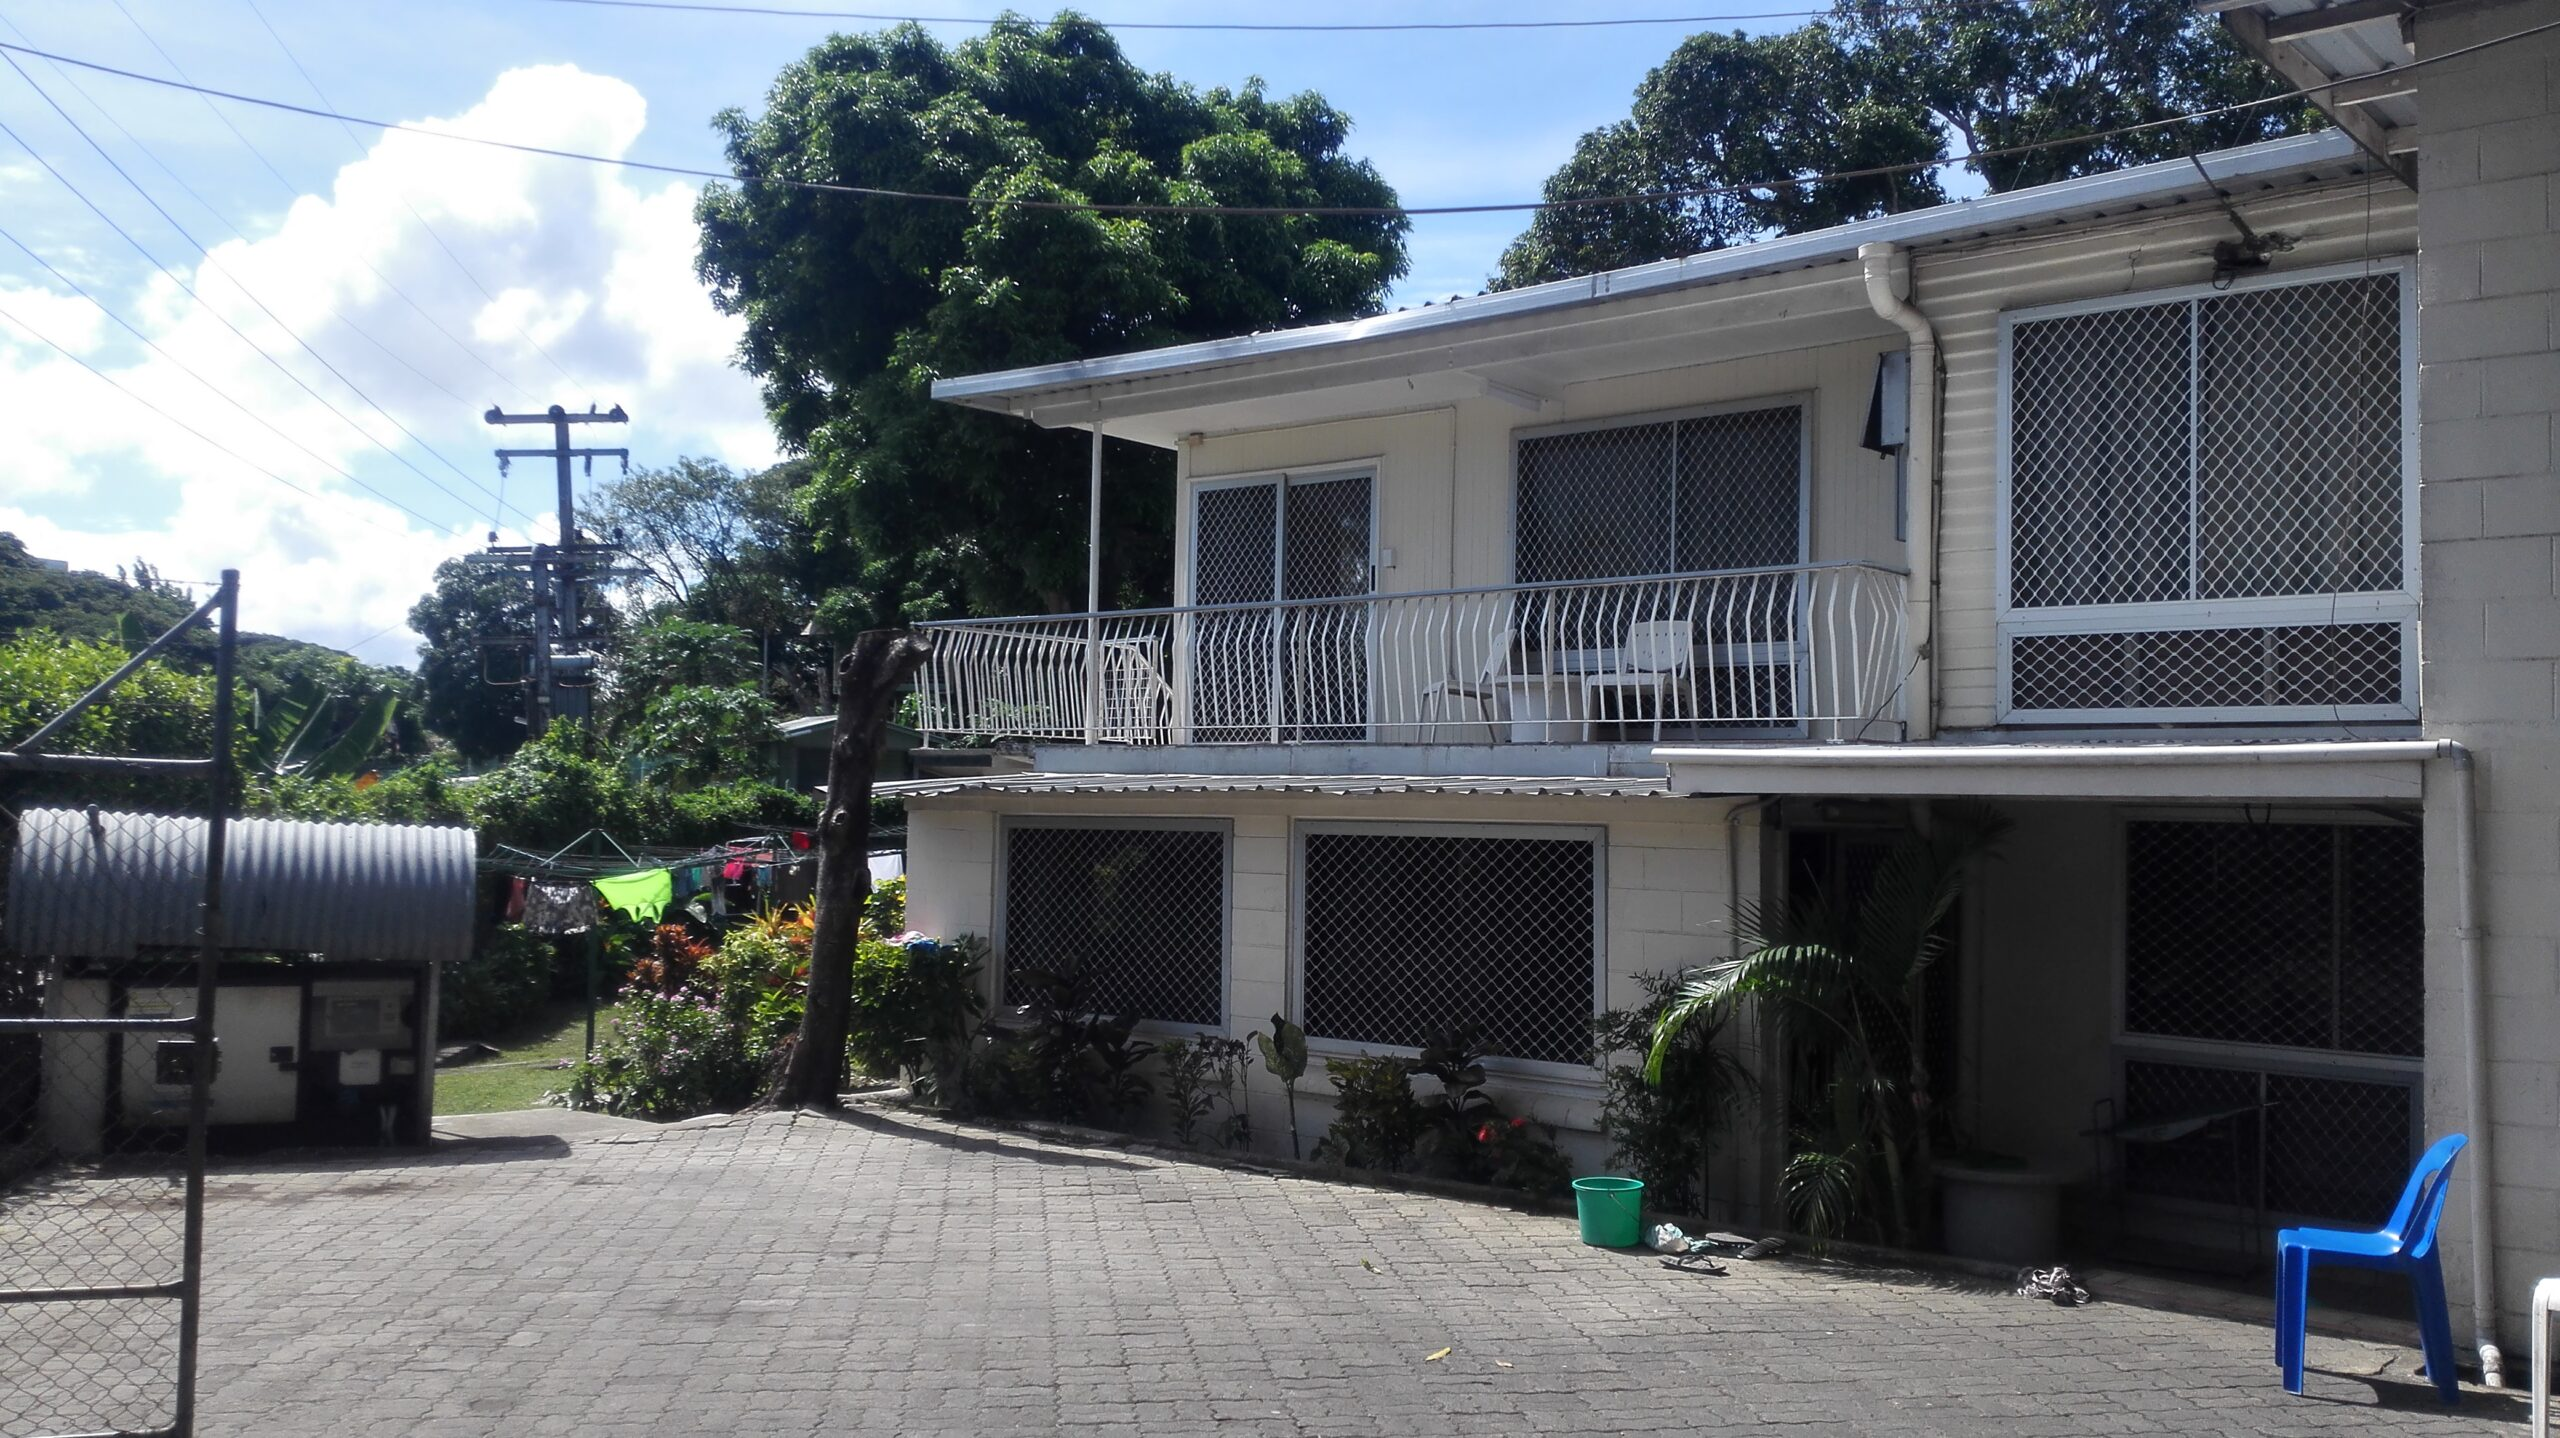 Apartment for rent – Korobosea